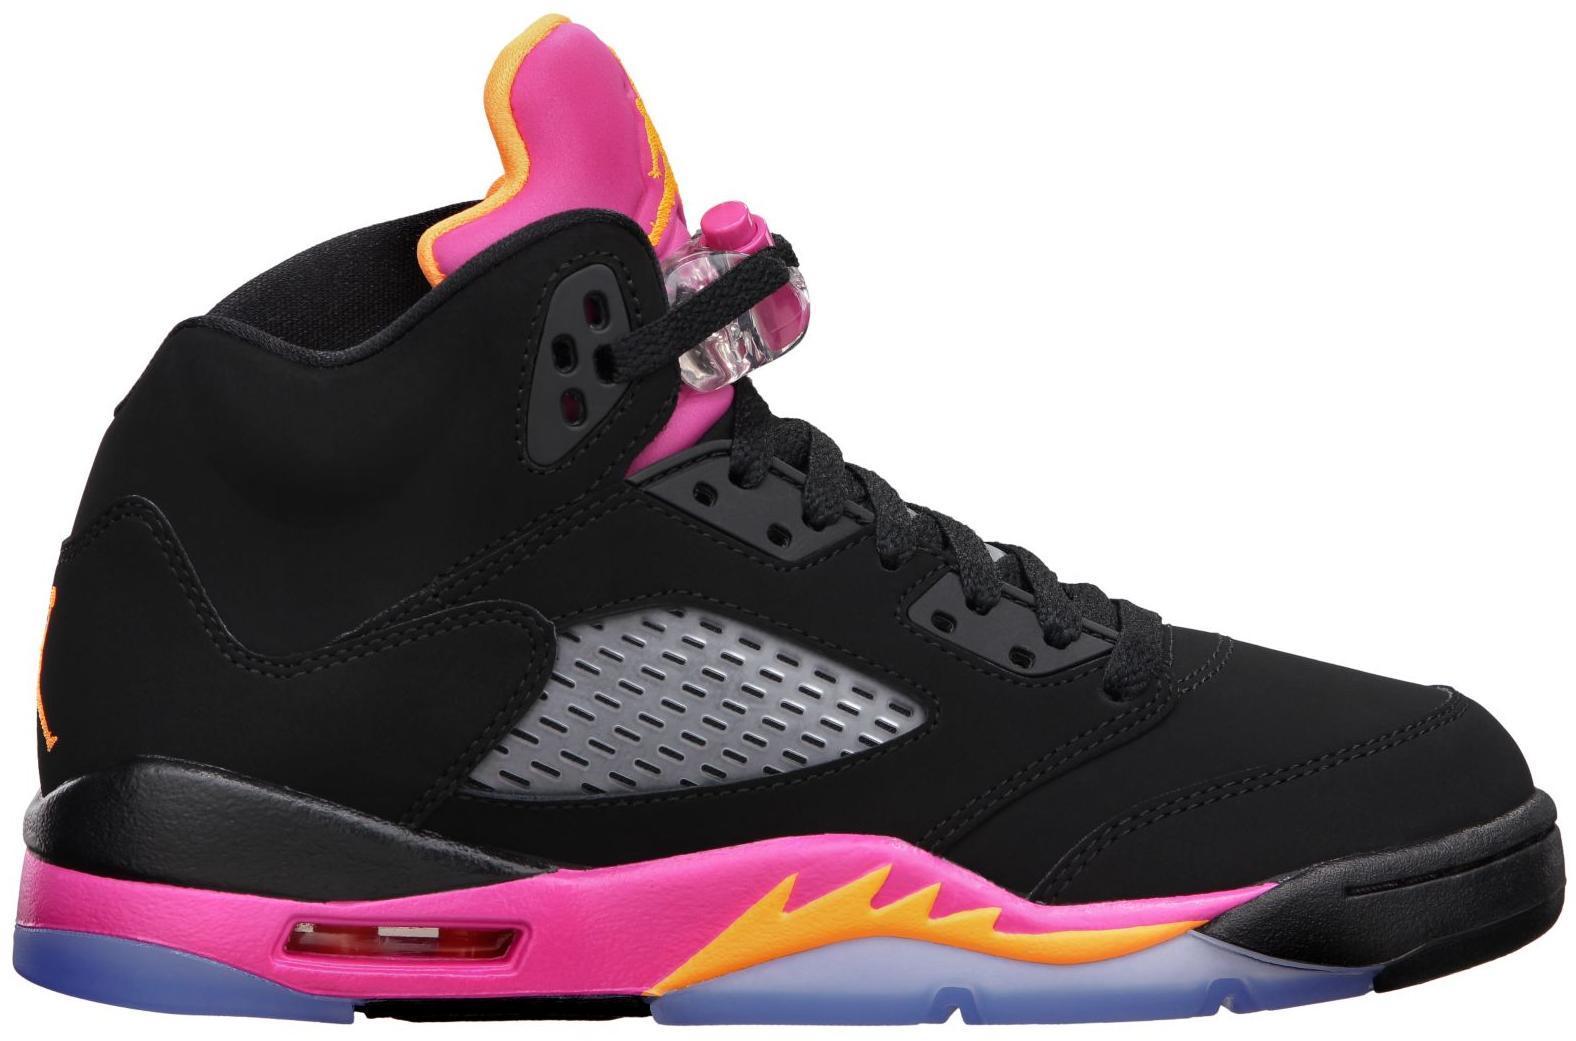 Jordan 5 Retro Black Pink (GS) - 440892-067